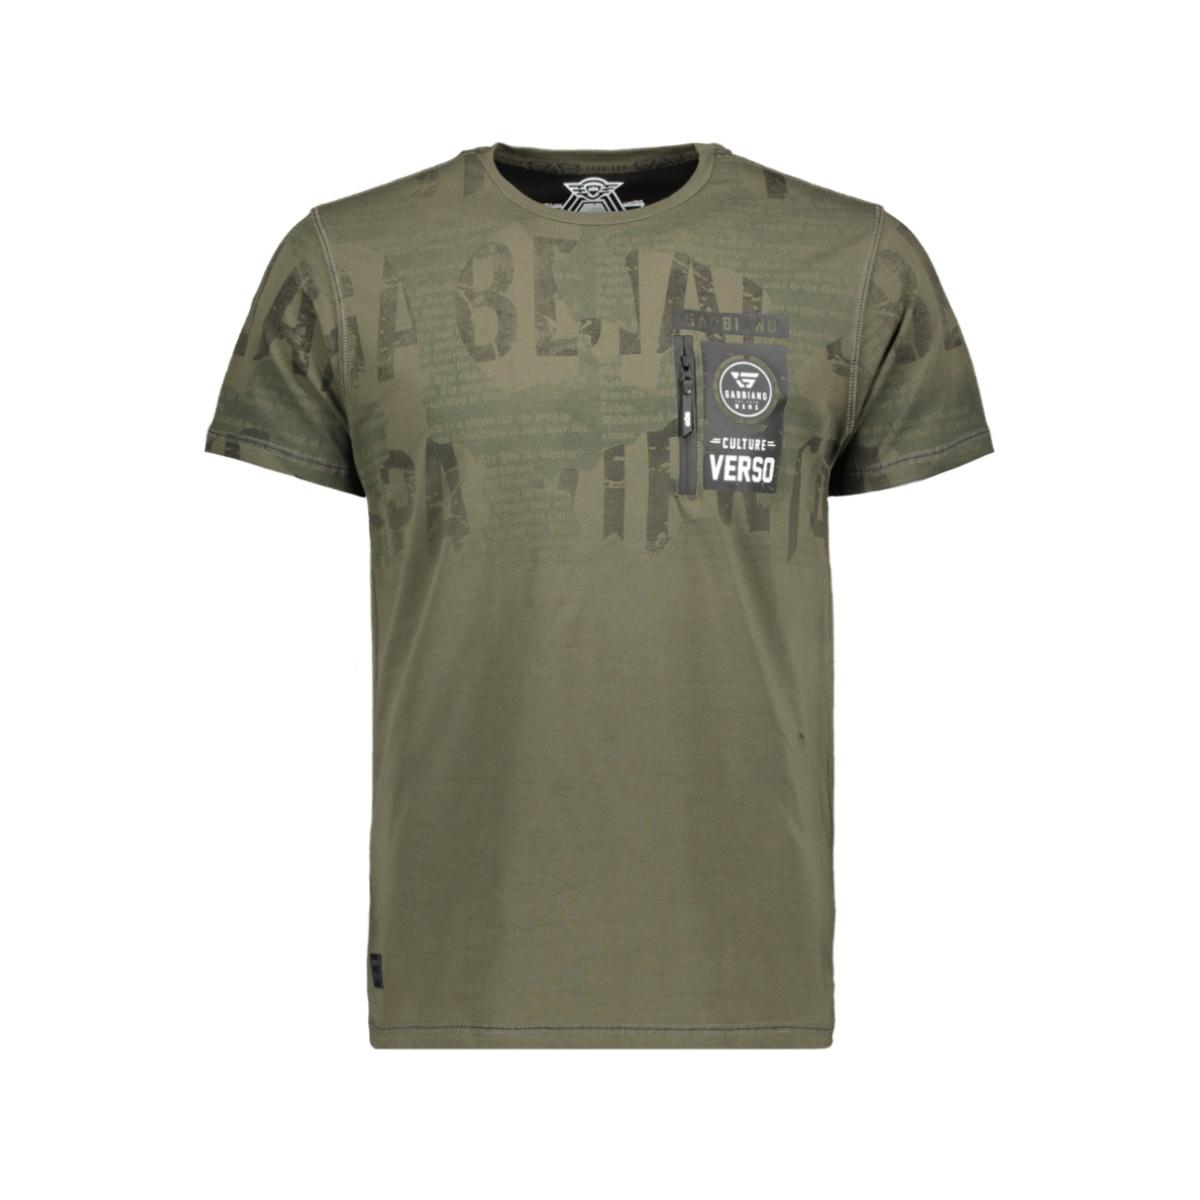 t shirt 13867 gabbiano t-shirt army